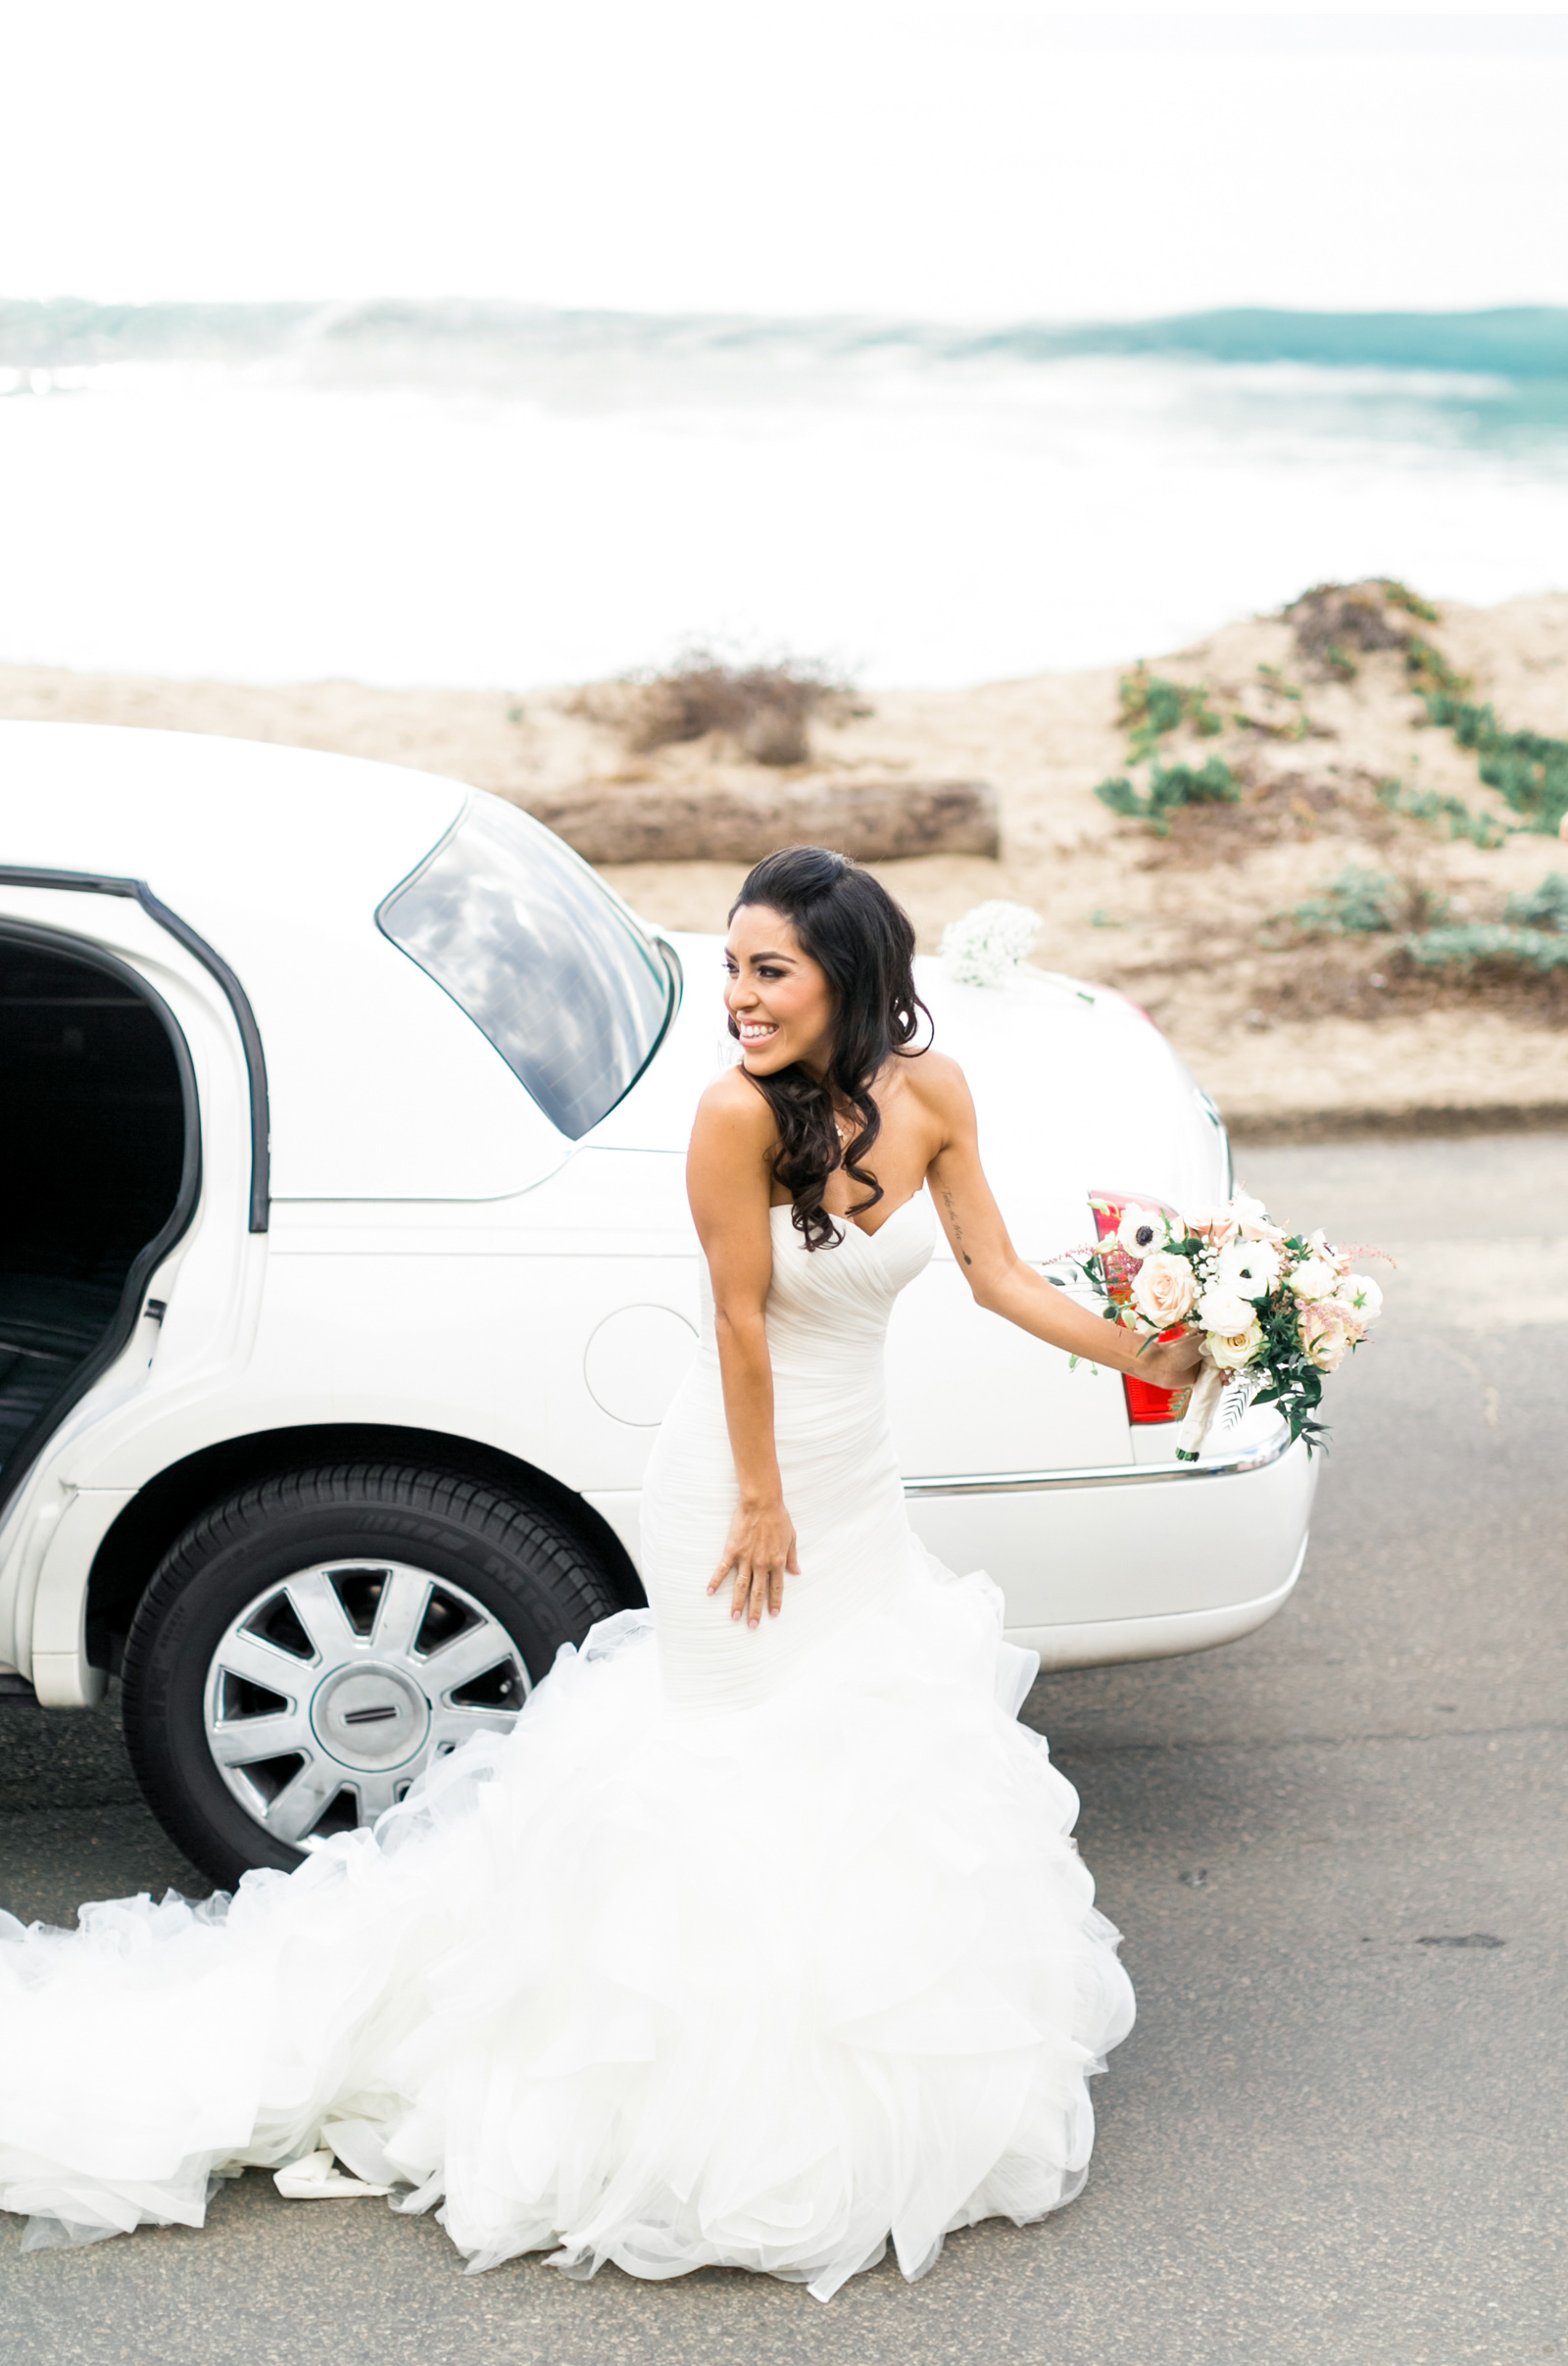 Malibu-First-Look-Natalie-Schutt-Photography-Rod-Brewster_04.jpg